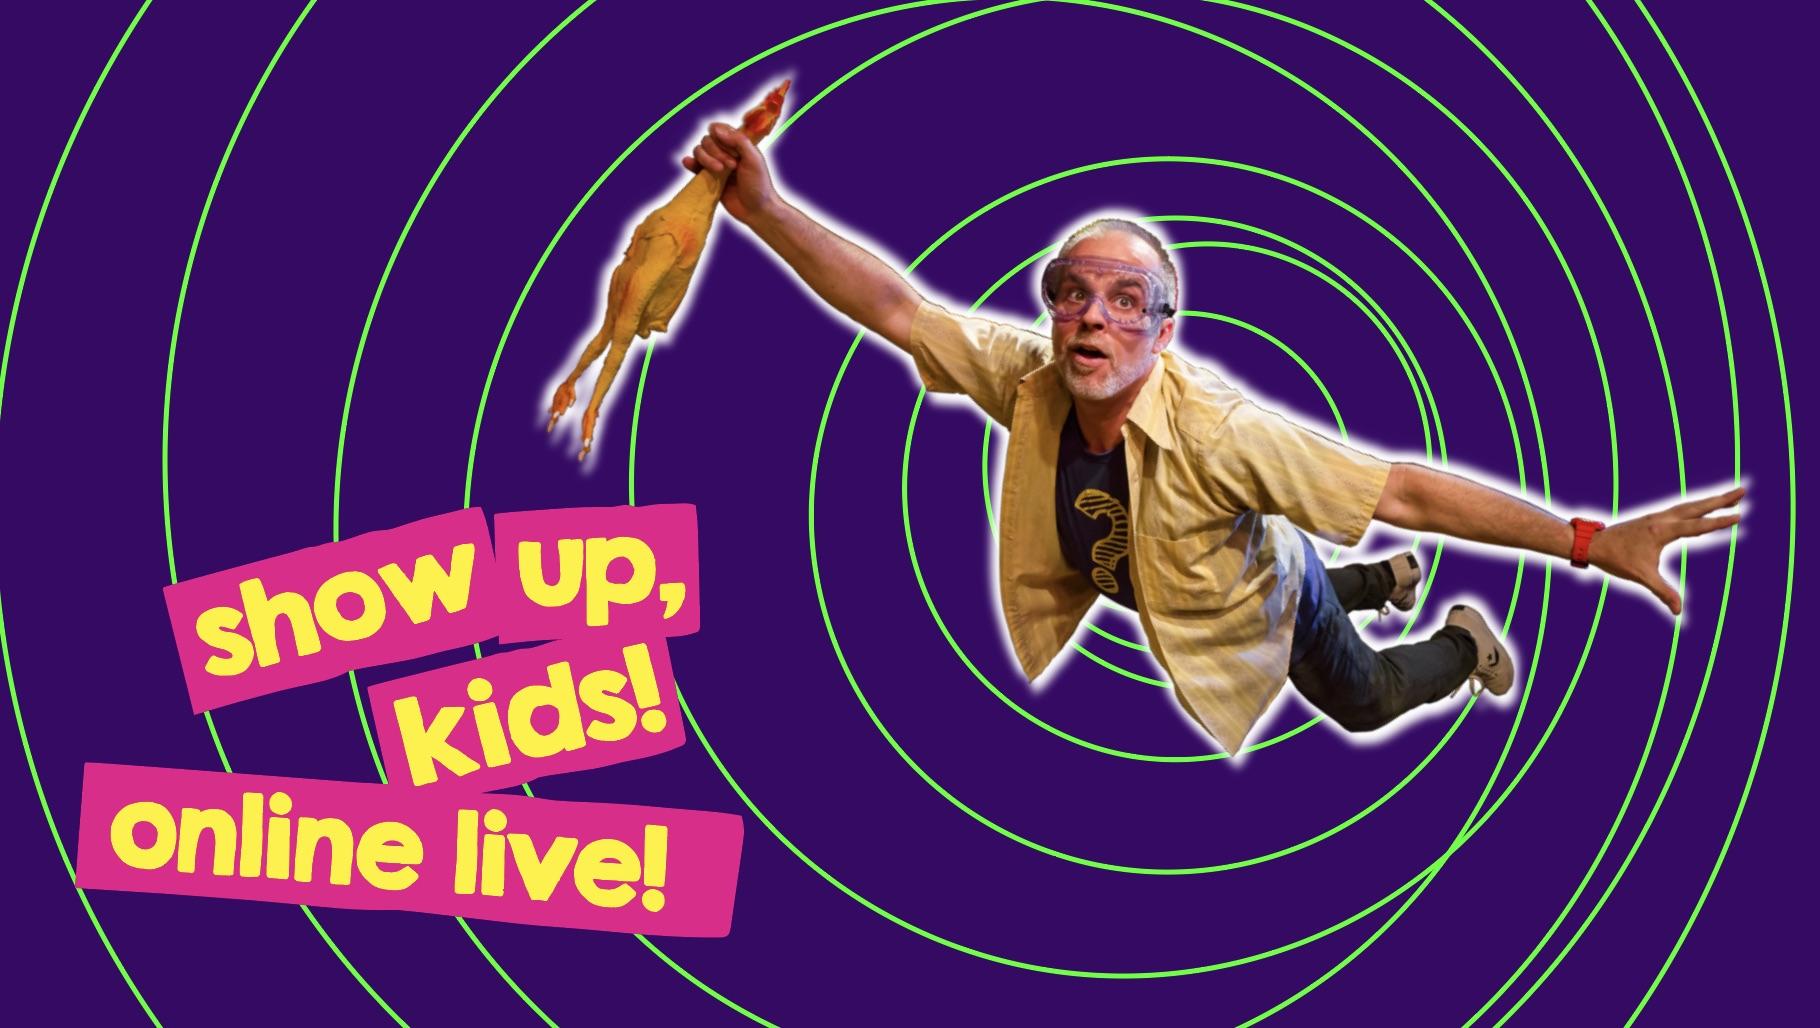 Show up, Kids! Online Live!